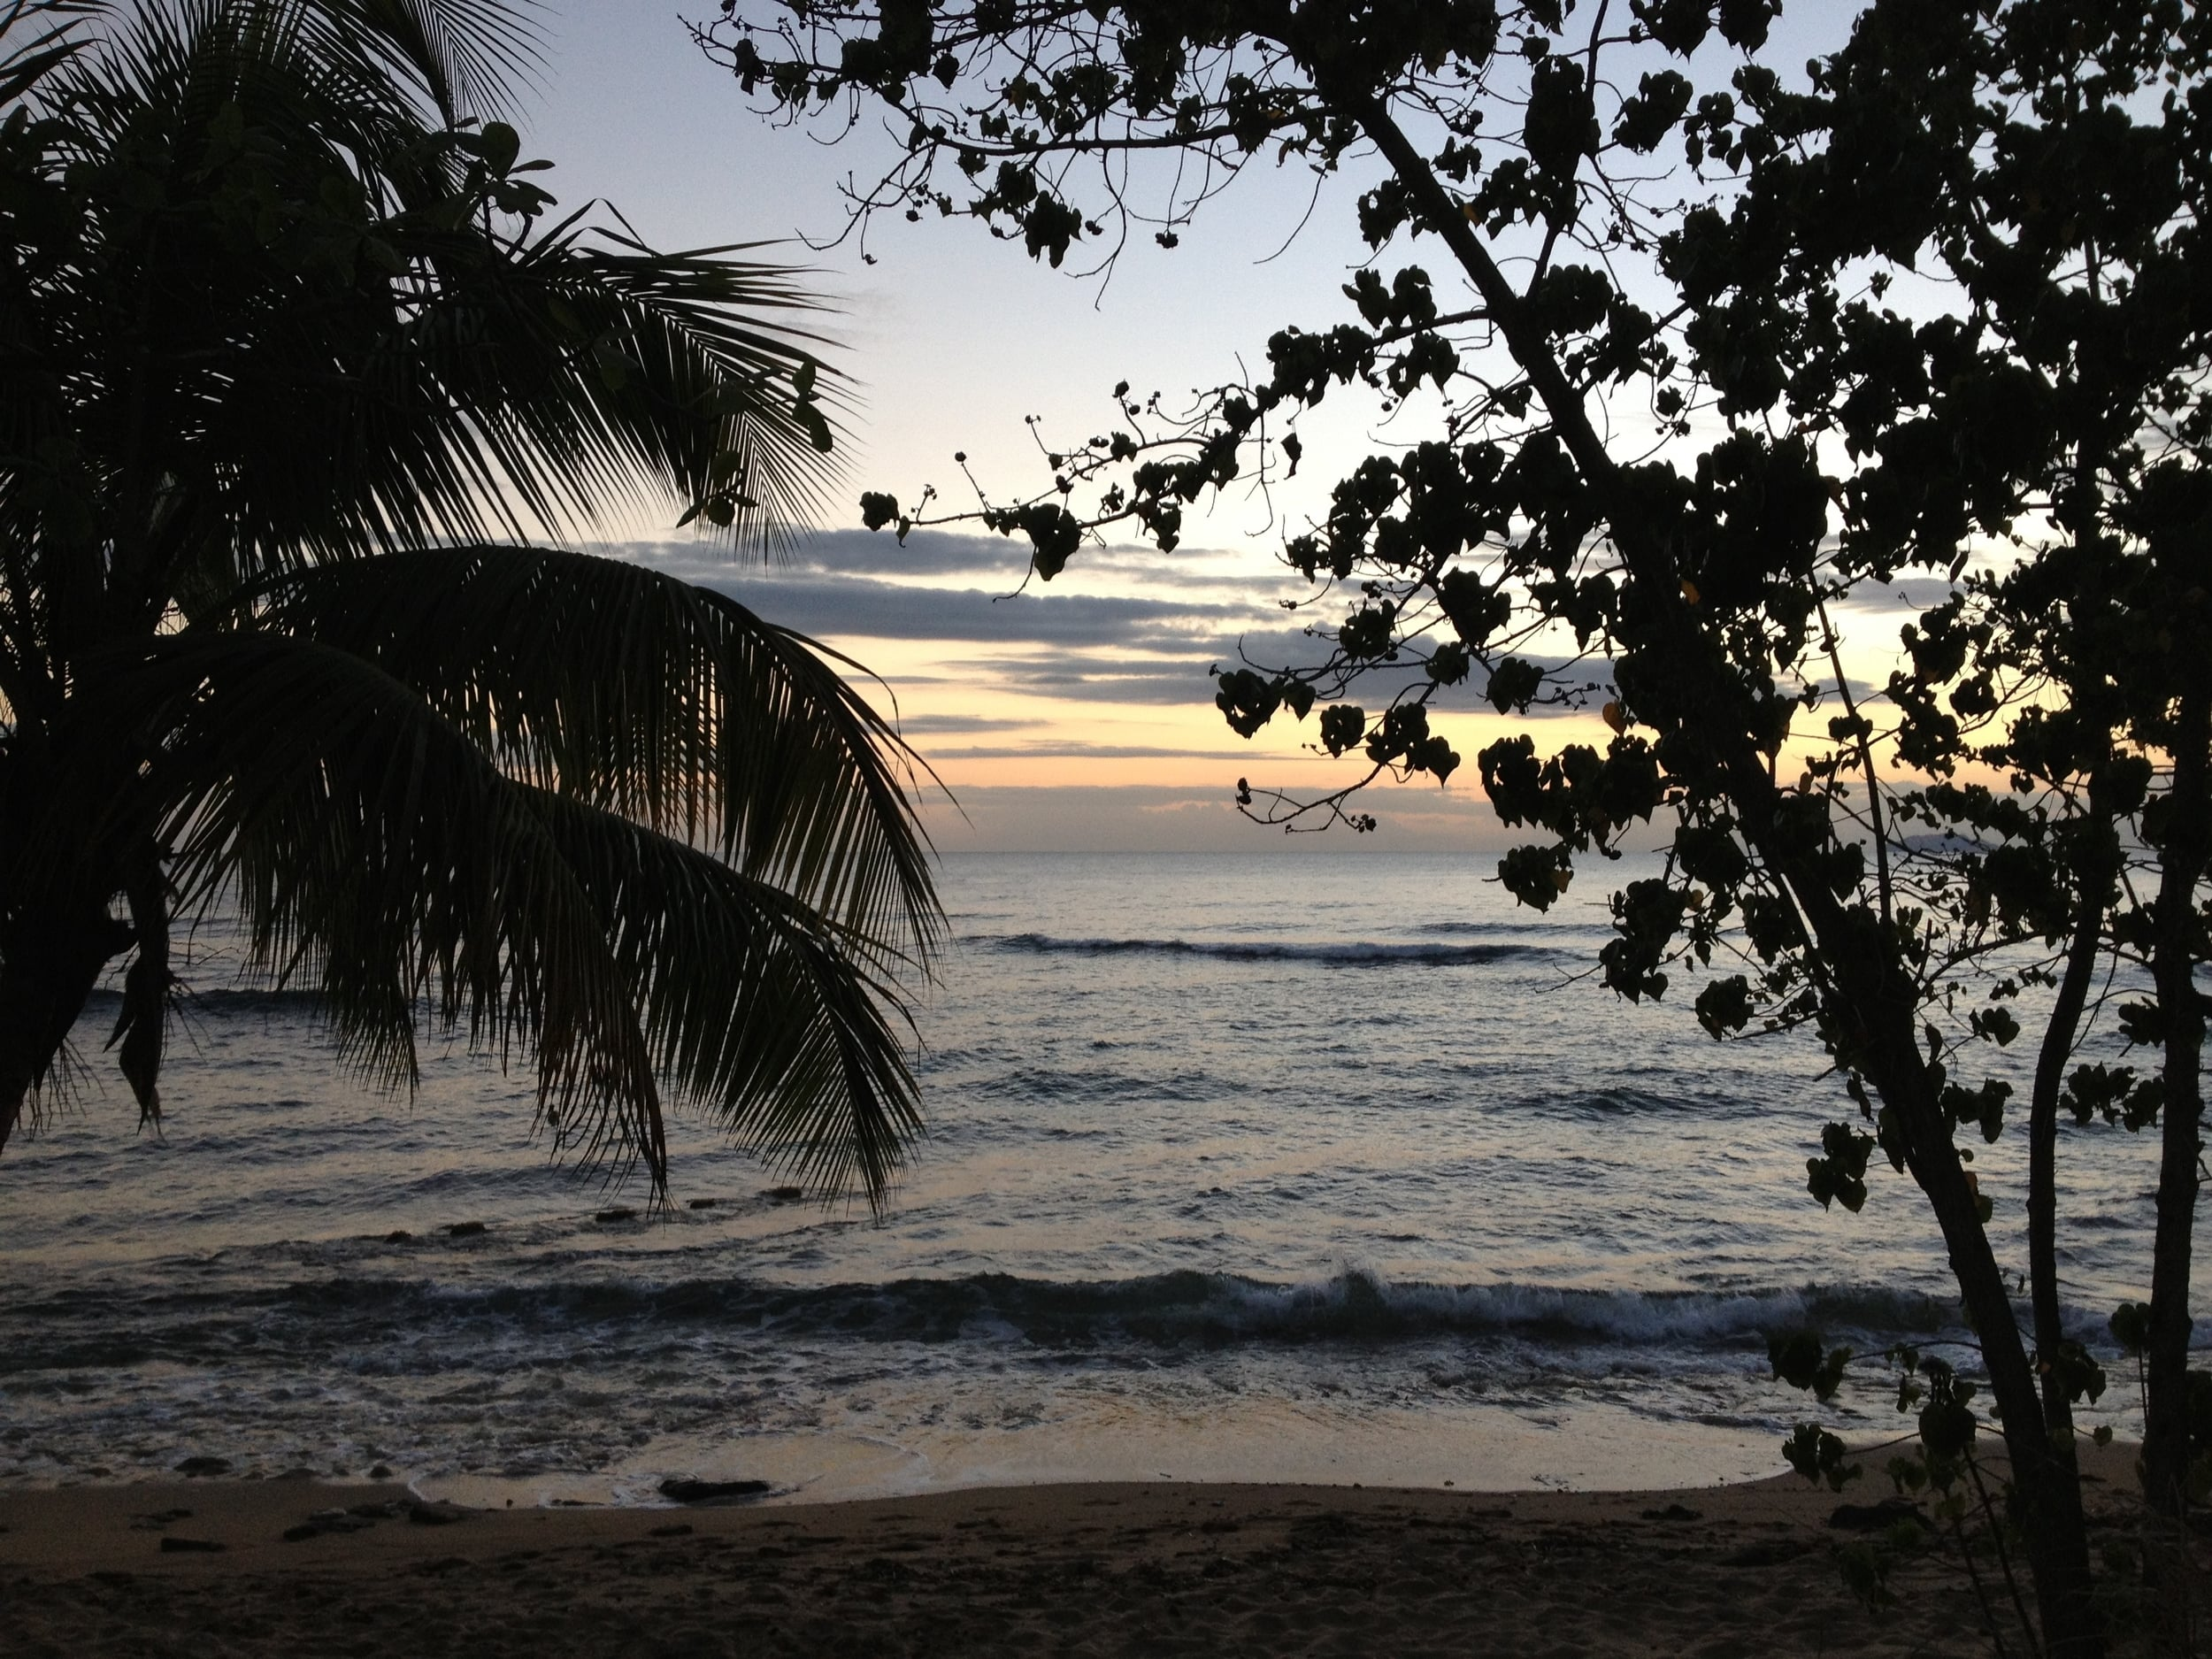 Rincon at Sunset